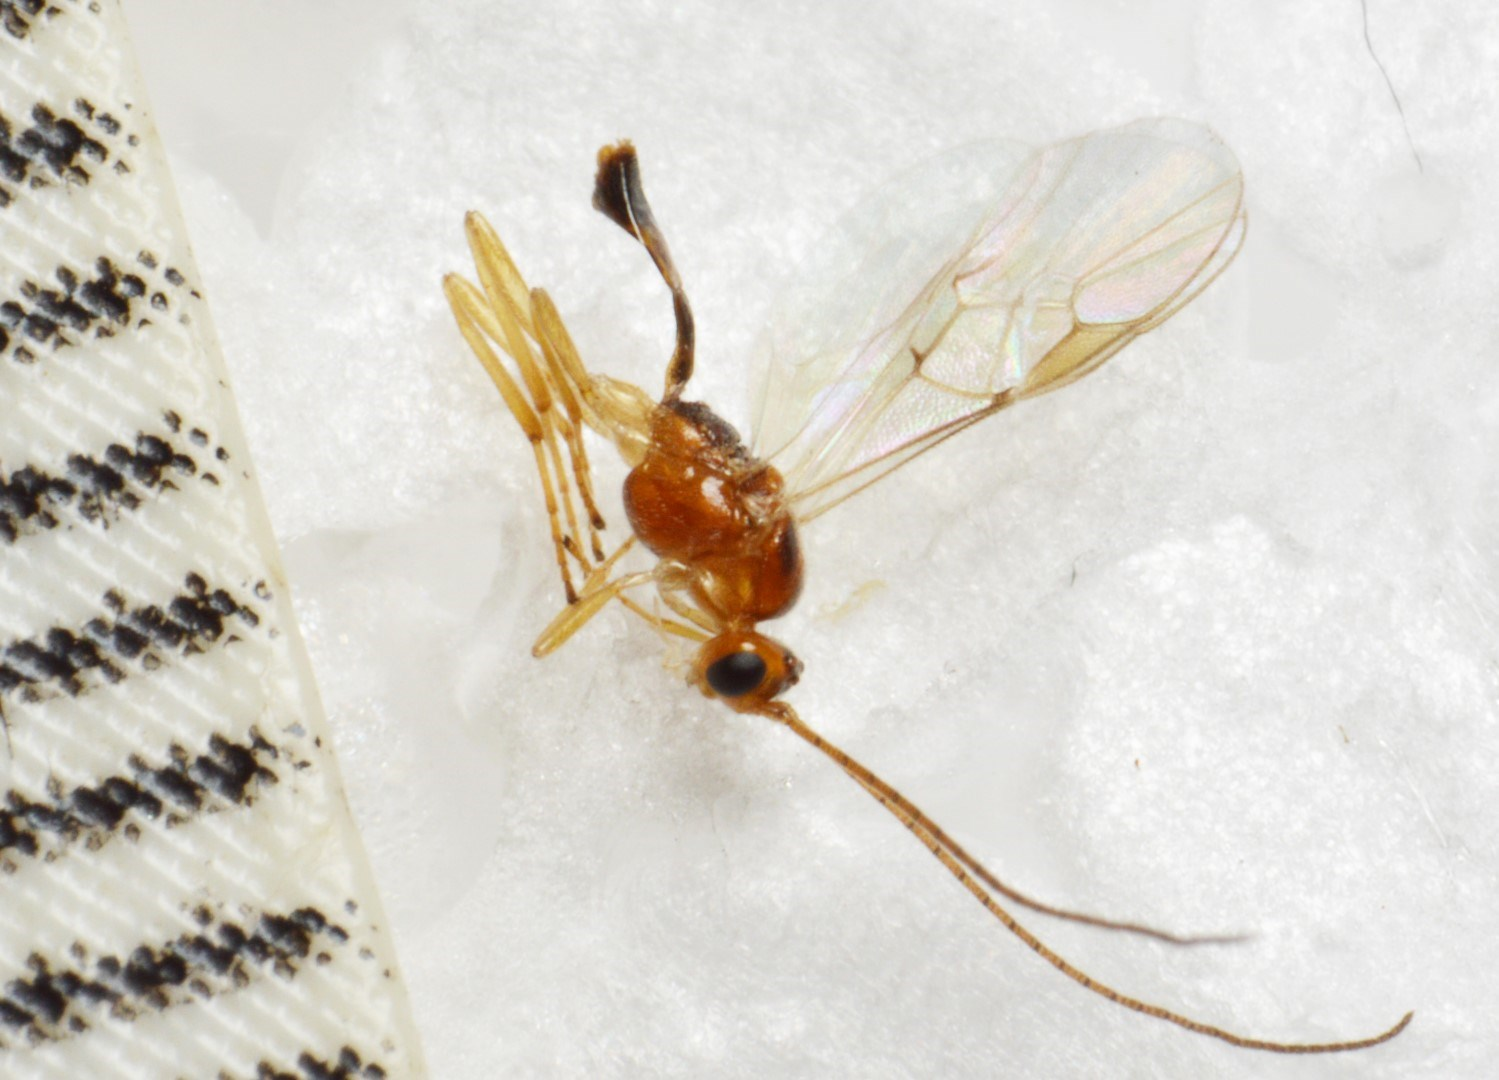 Meteorus ictericus